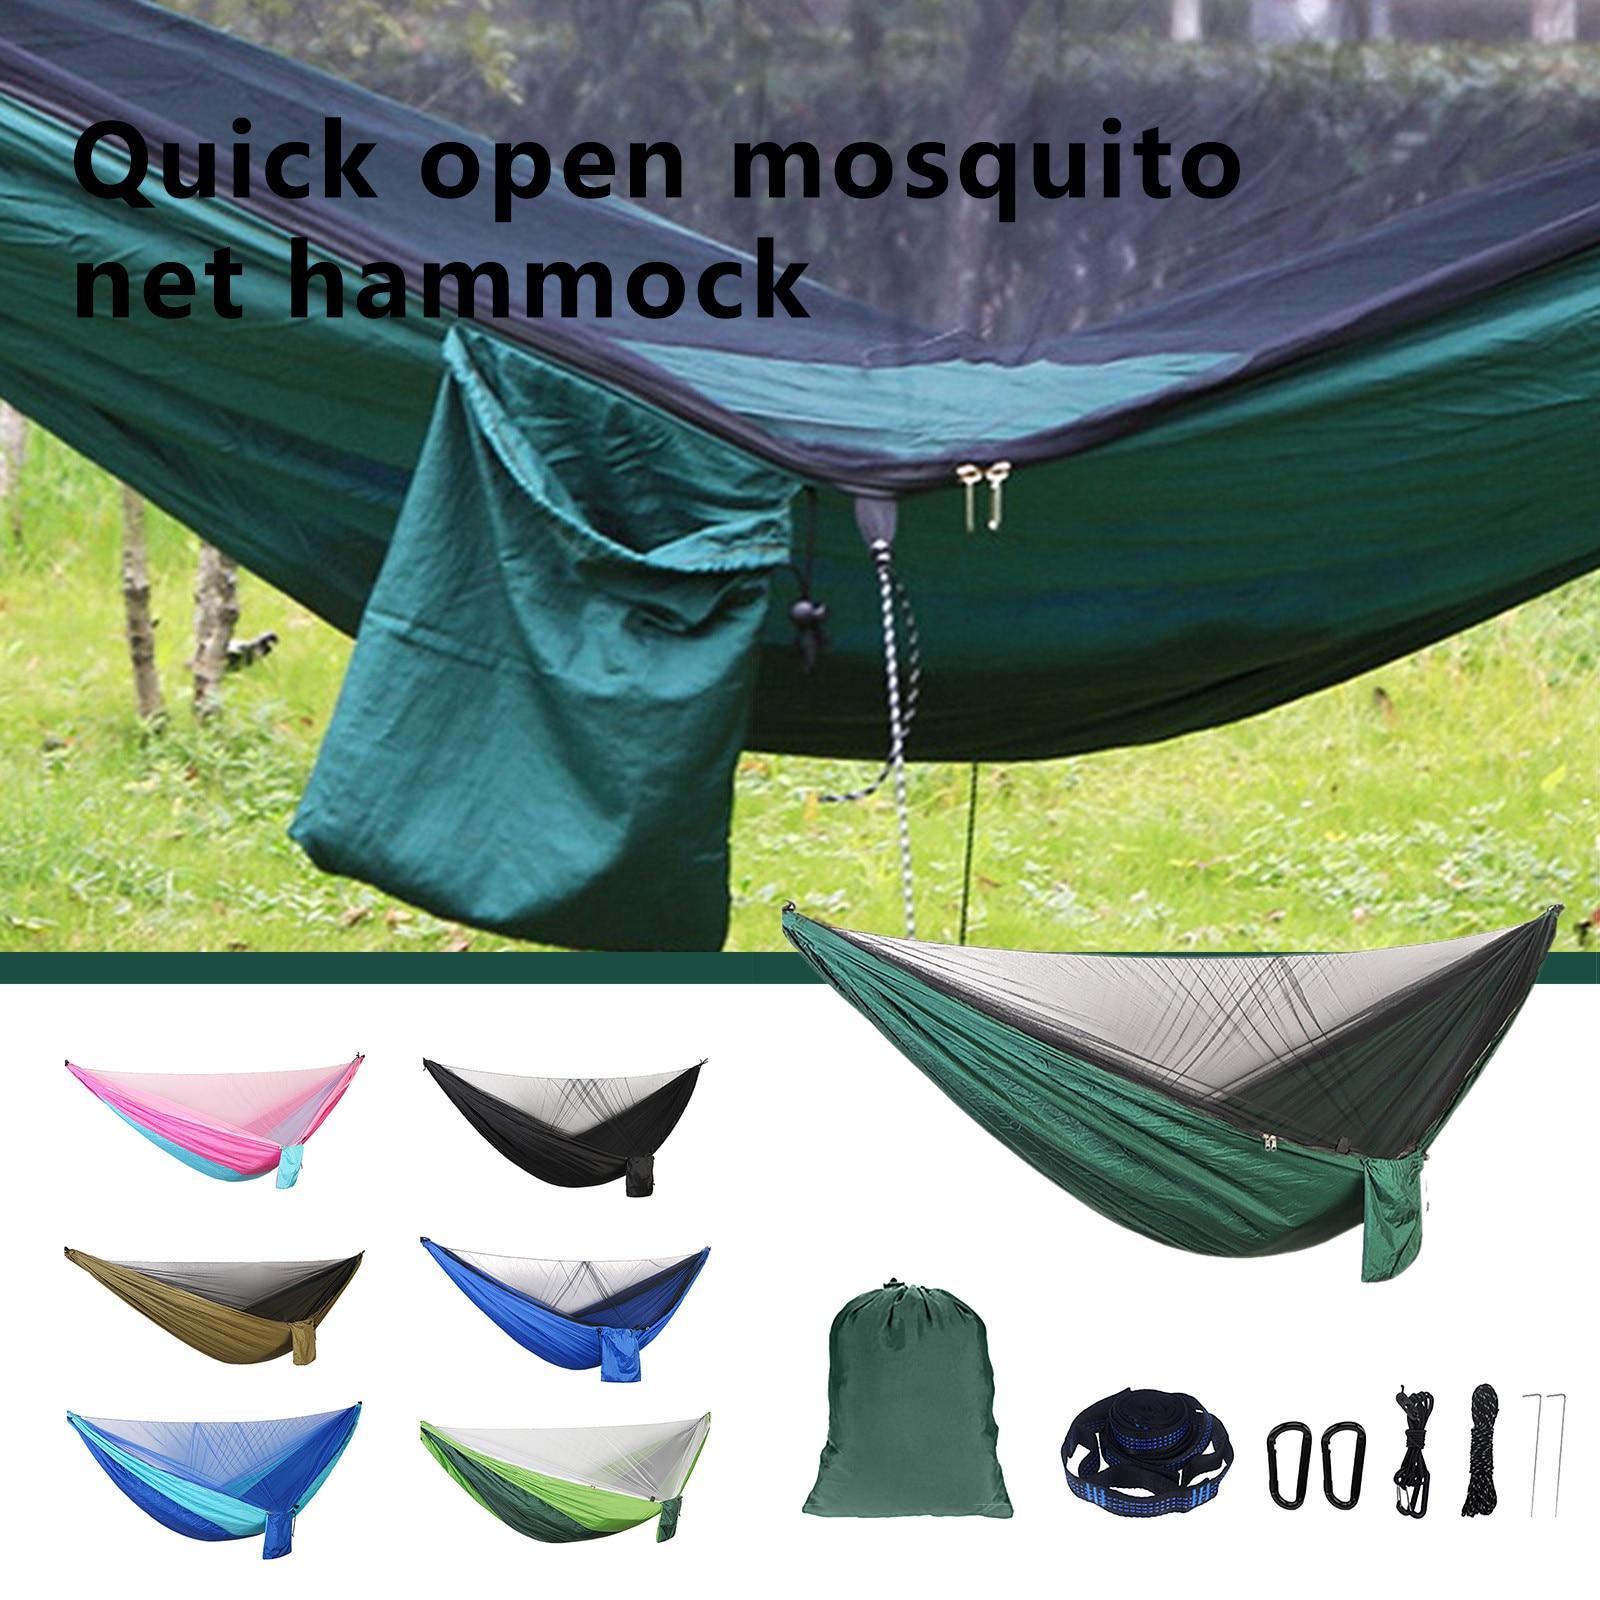 Camping Hammock Ultraligh Portable Outdoor Camping Mosquito Net Nylon Hanging Bed Sleeping Swing гамак туристический